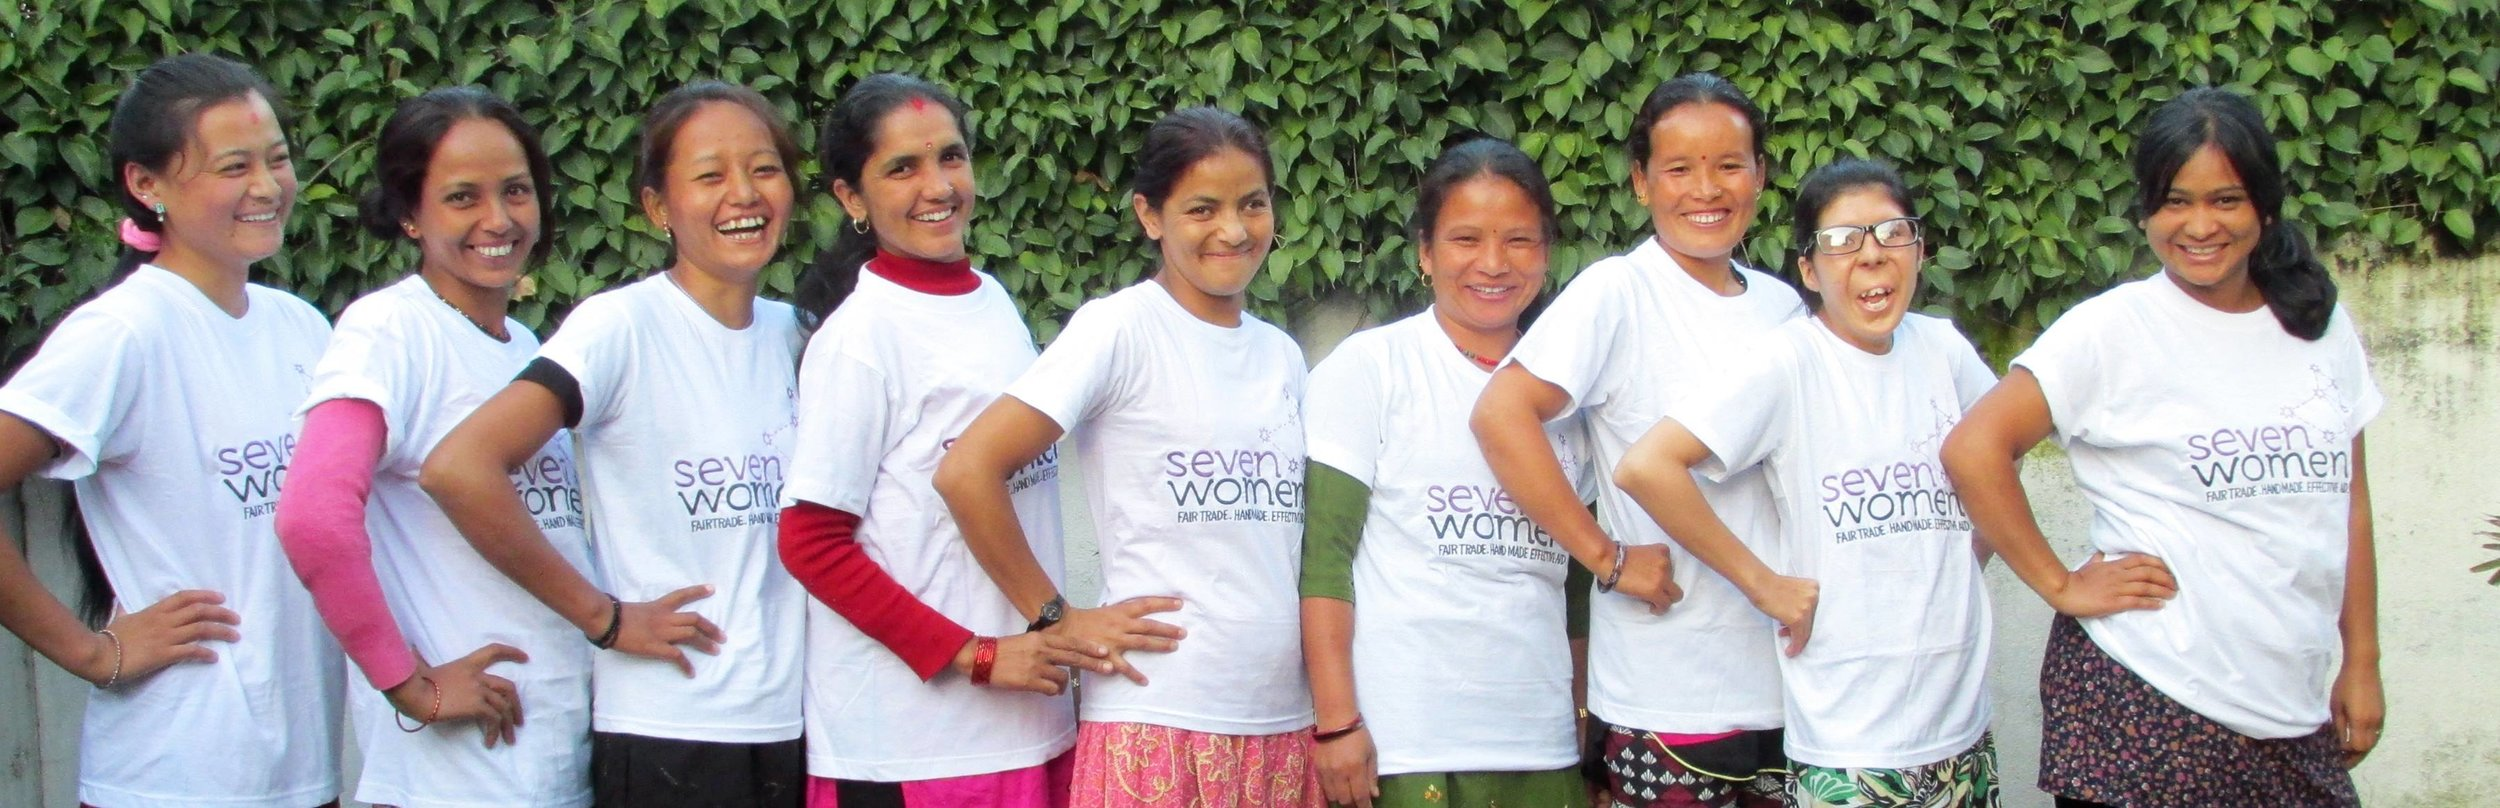 Seven Women uniform